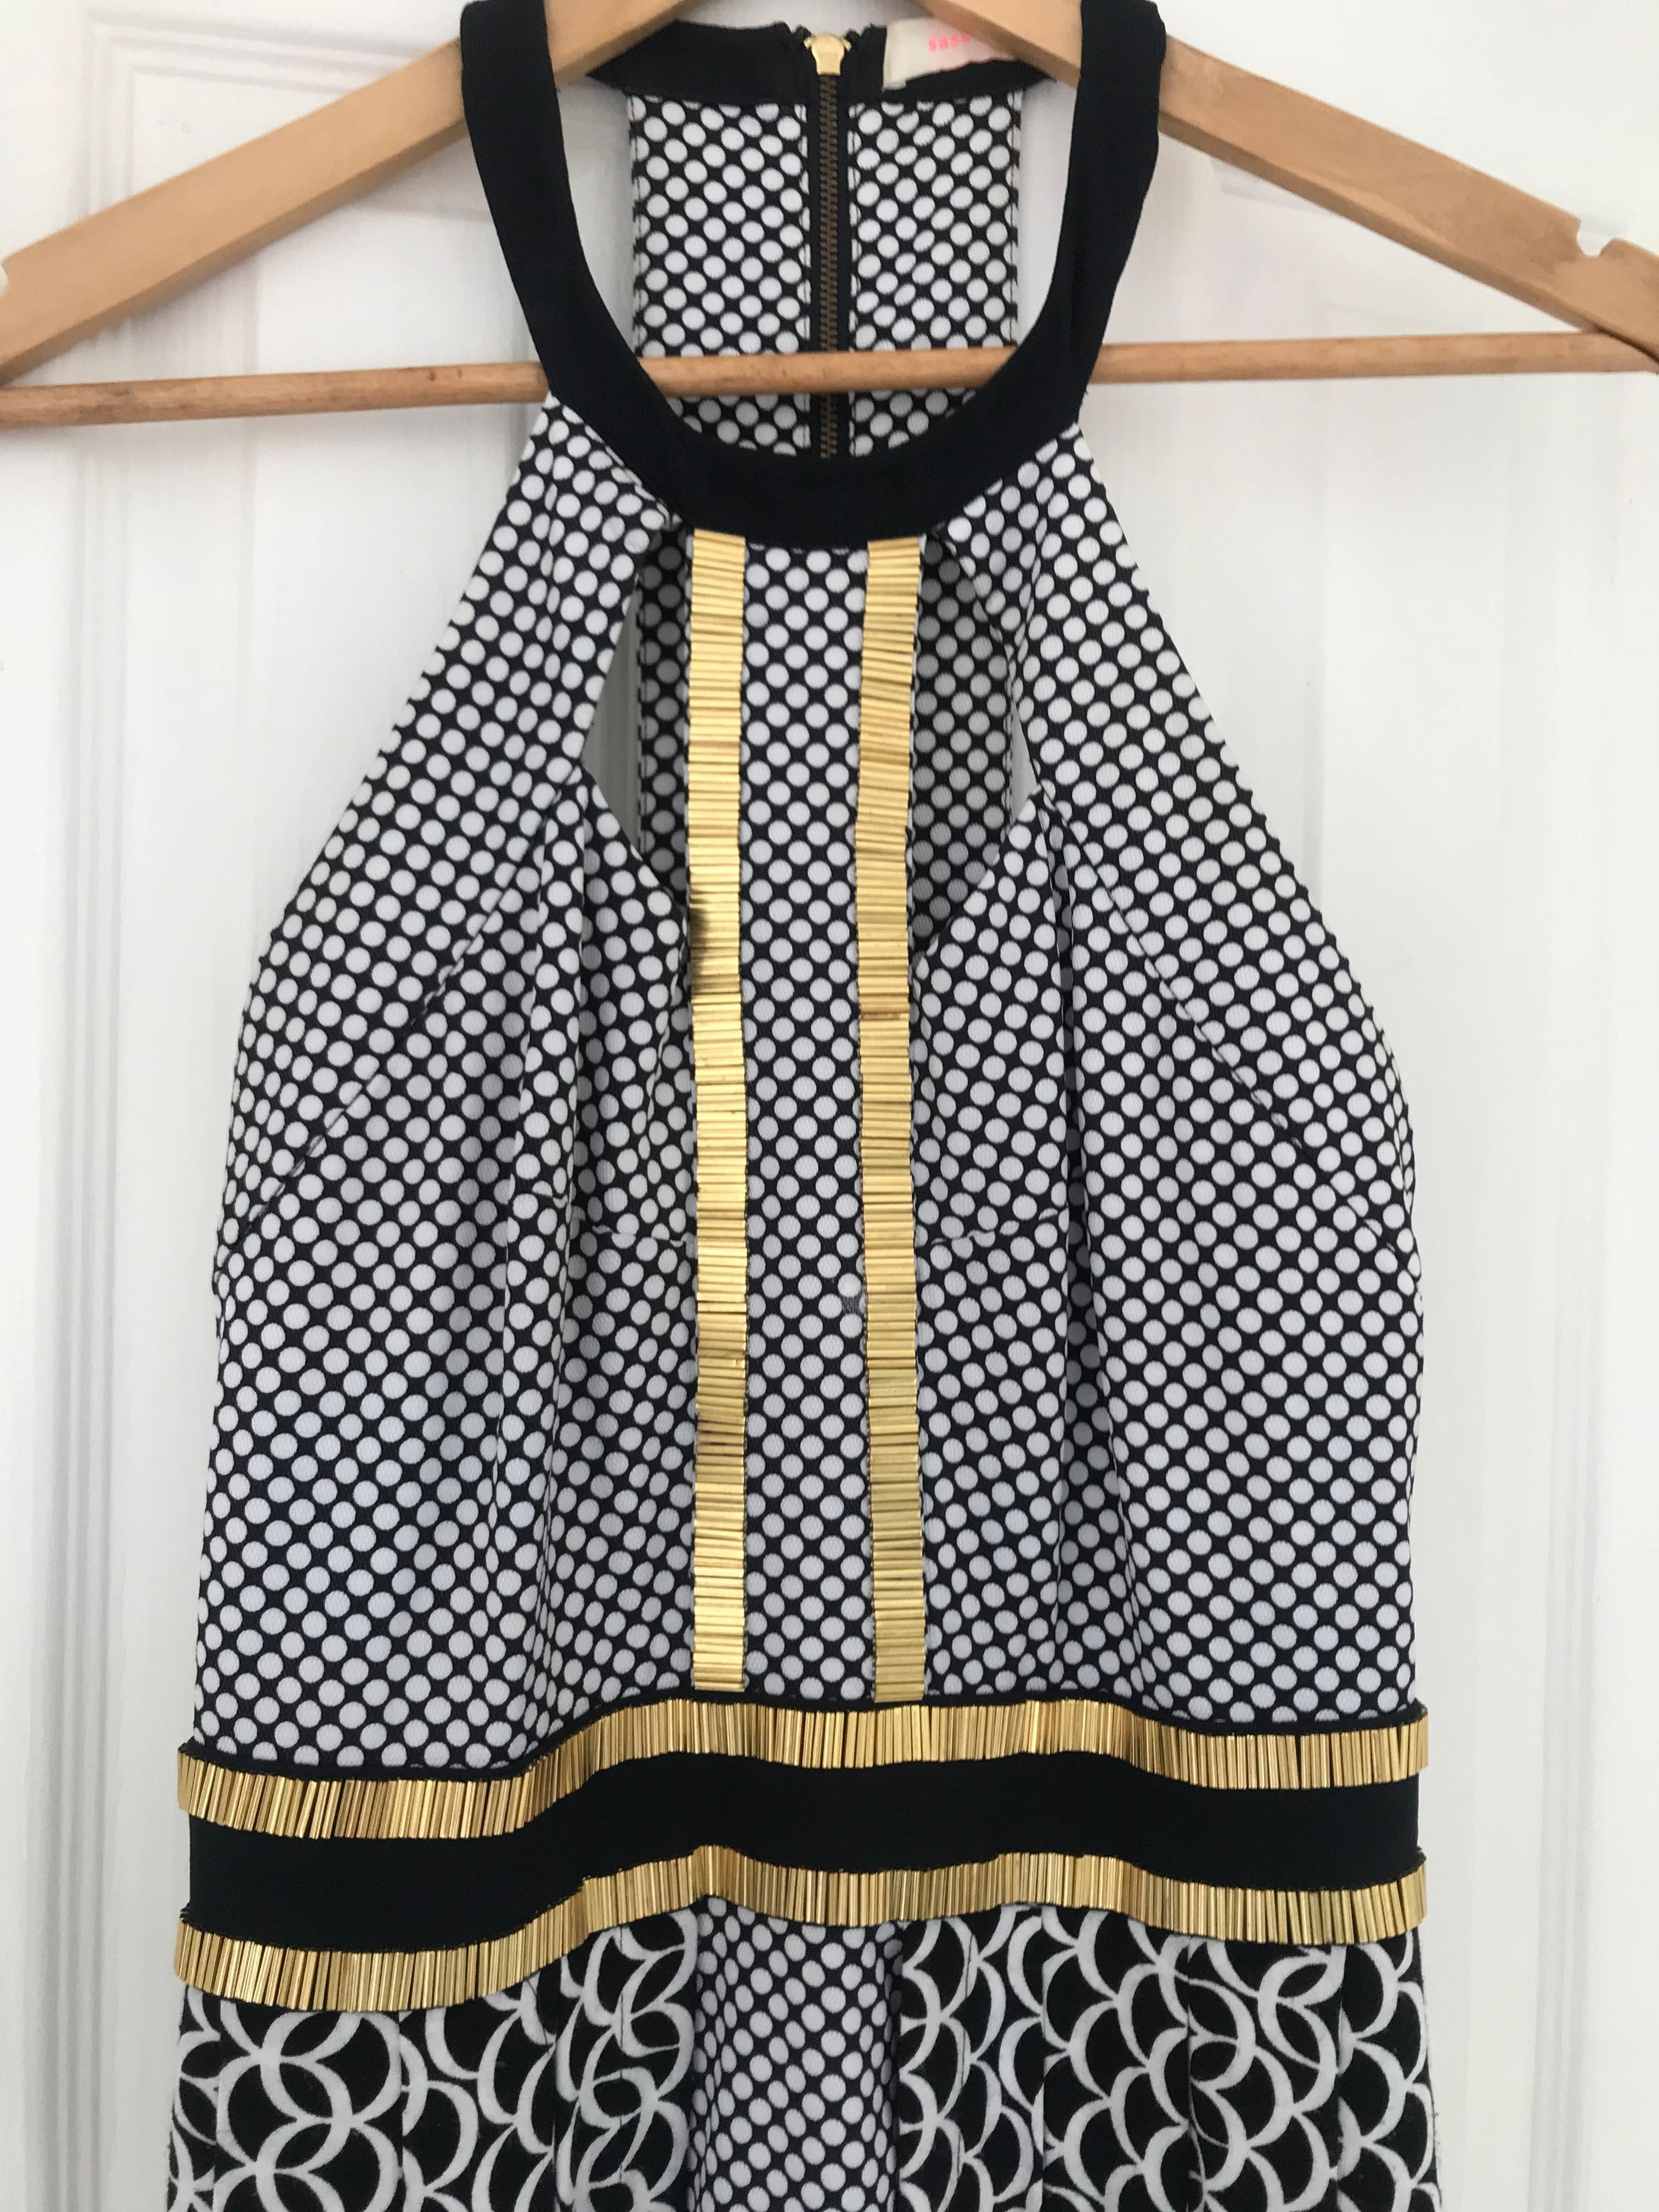 Sass & Bide The Invincible Maxi Dress Size 8 | The Volte